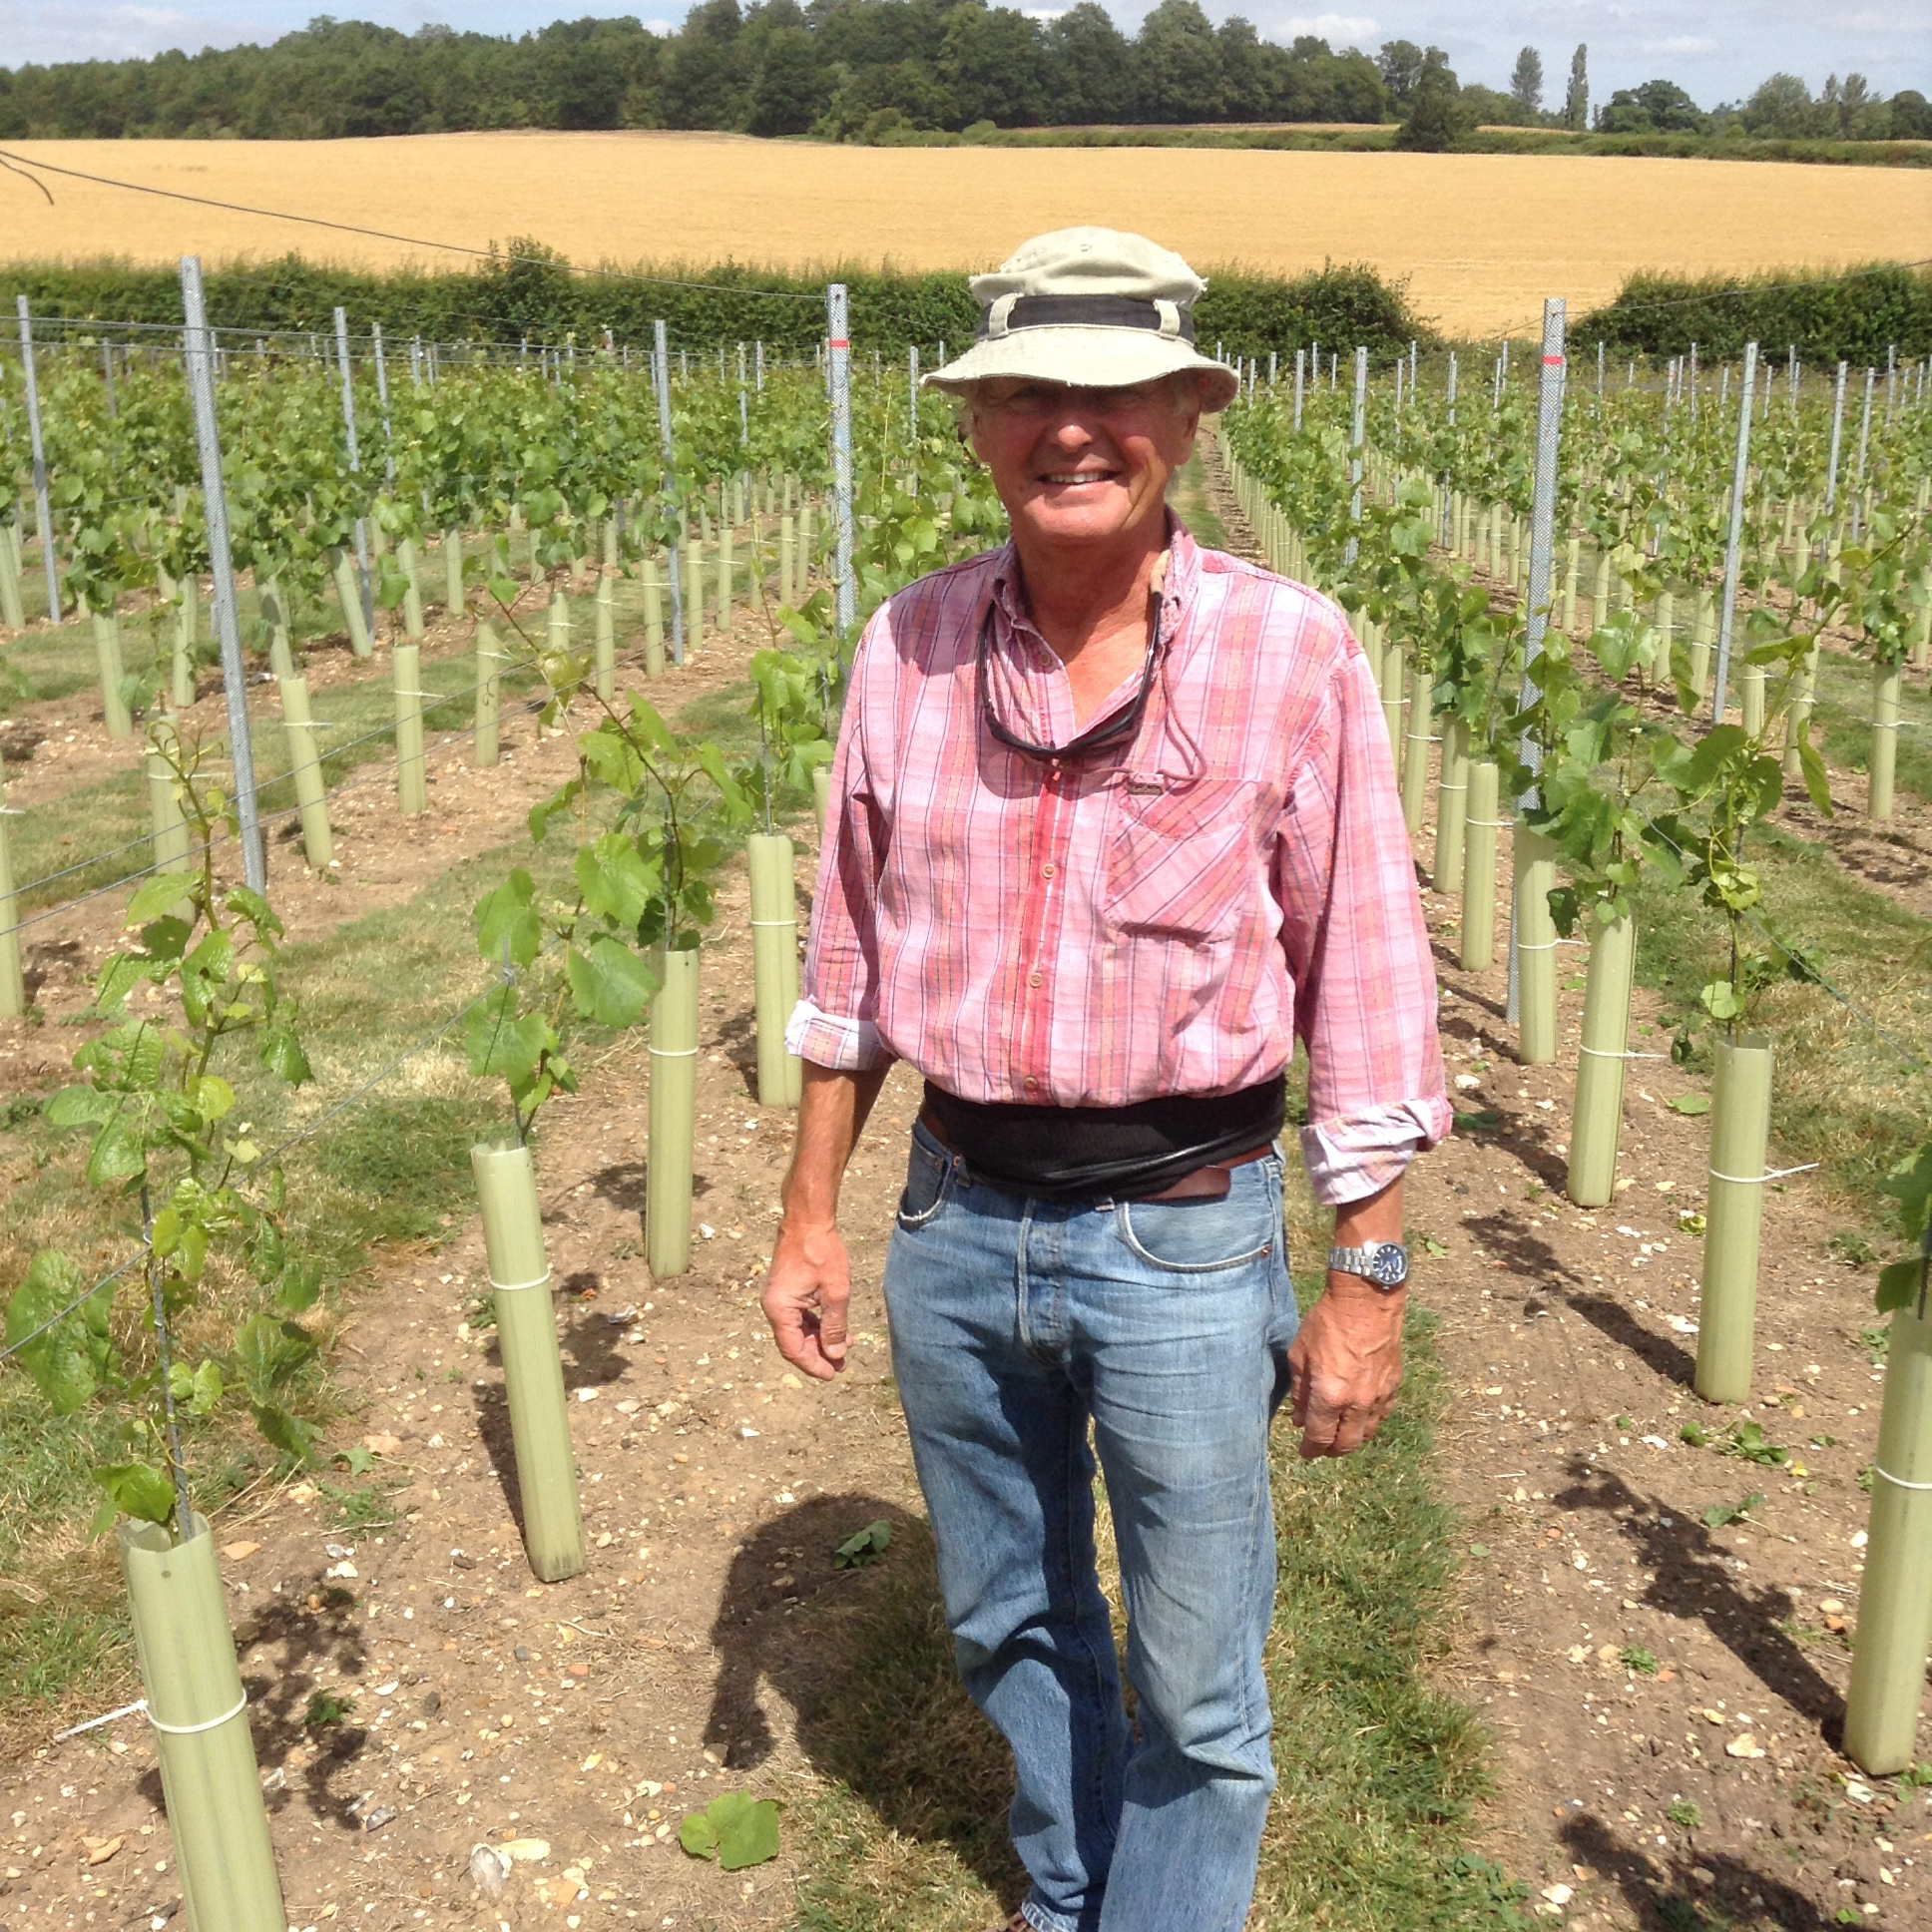 7  Robert in the vineyard 2.JPG